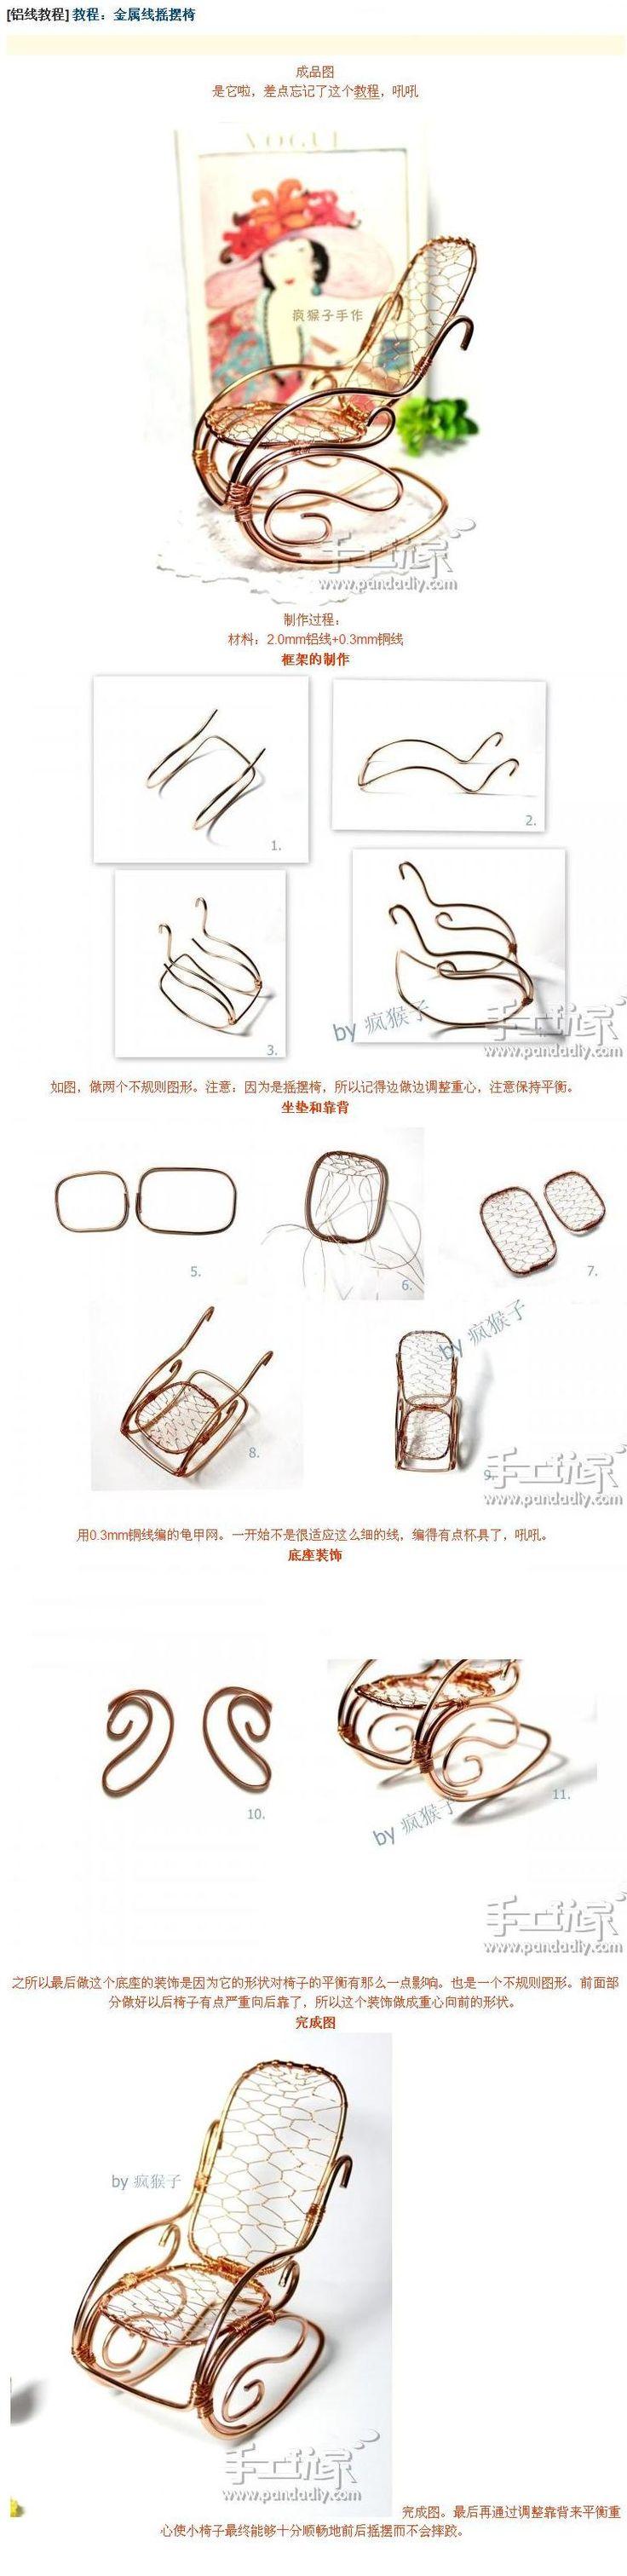 Miniature rocking chair - DIY  铝线教程:金属线摇摆椅